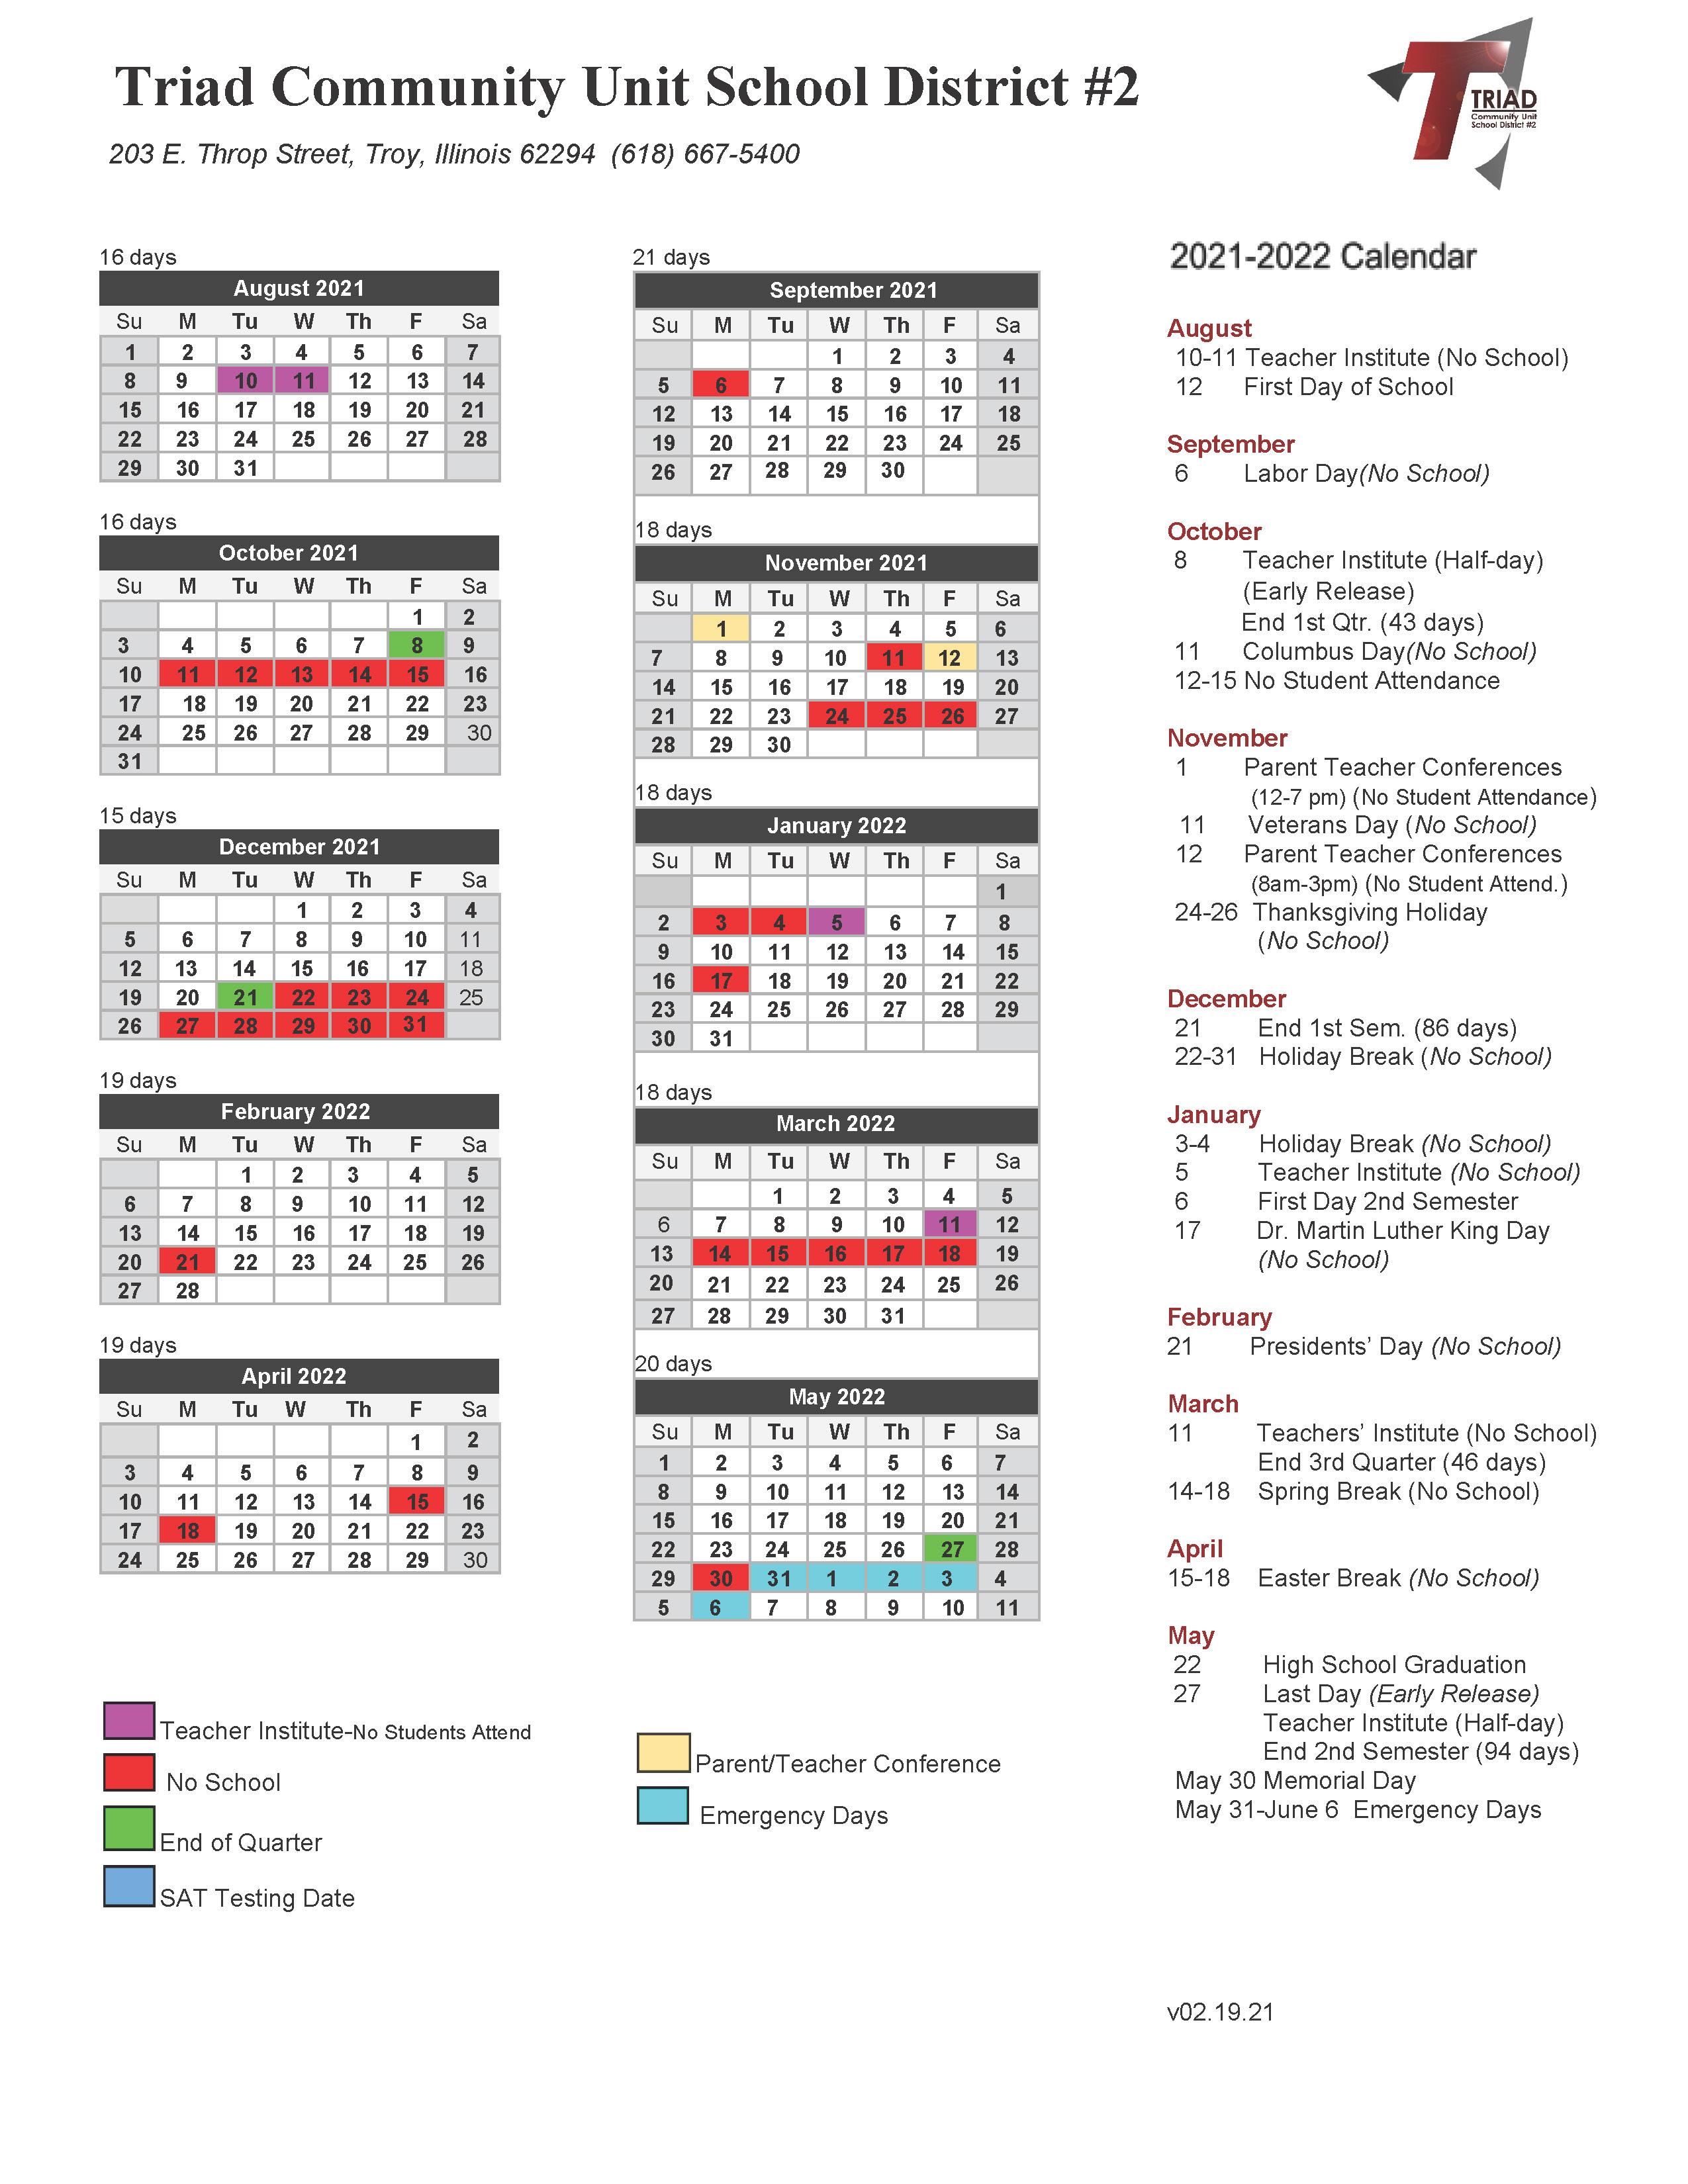 21-22 district calendar